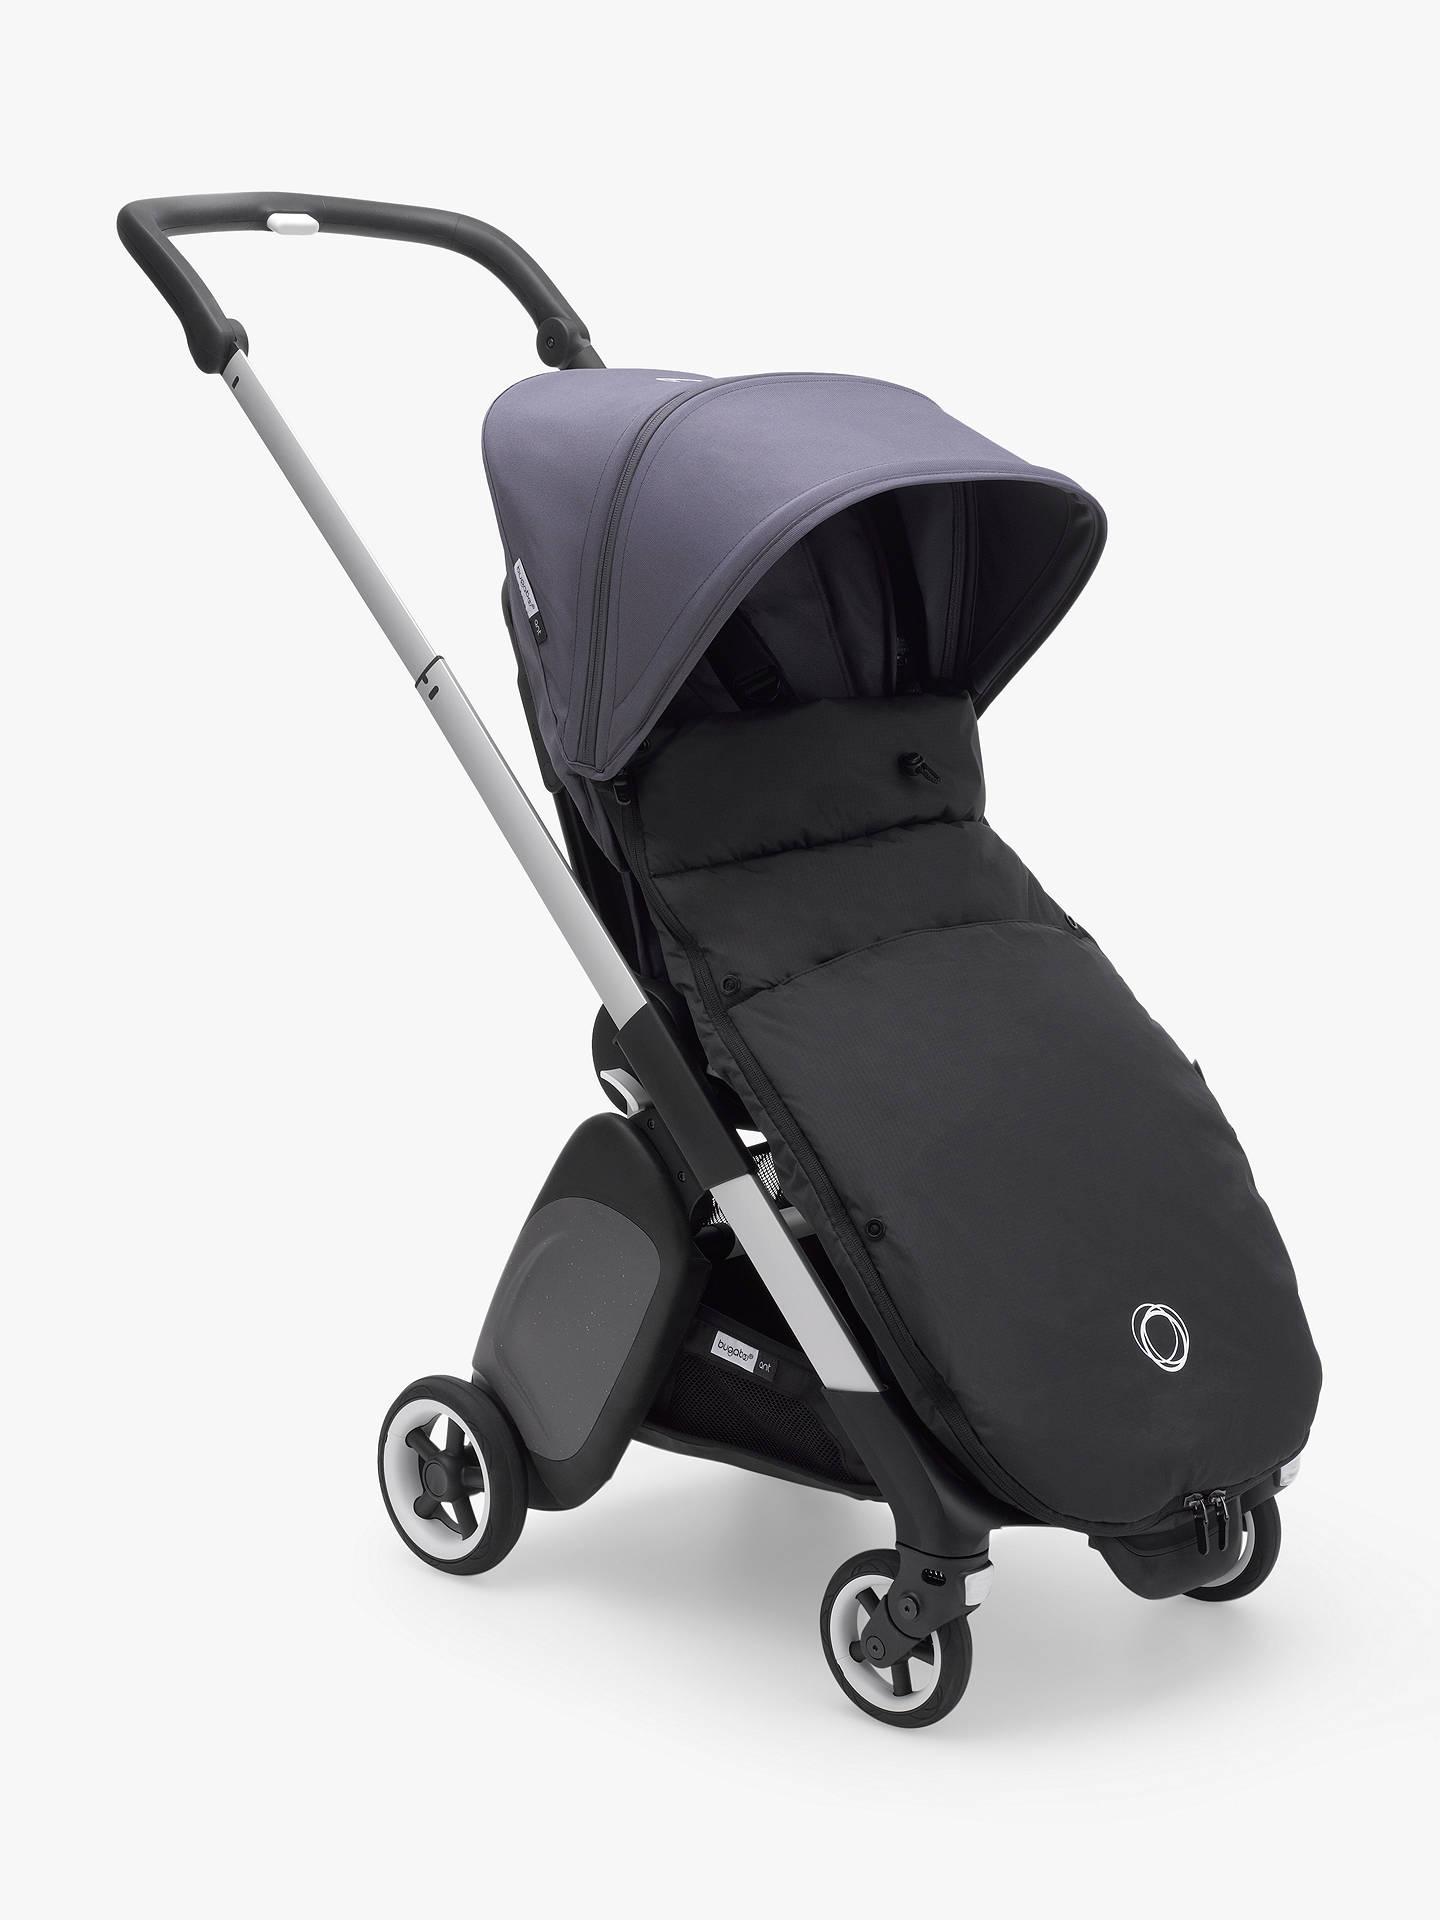 Bugaboo Baby Child Pushchair Stroller Buggy Classic Footmuff